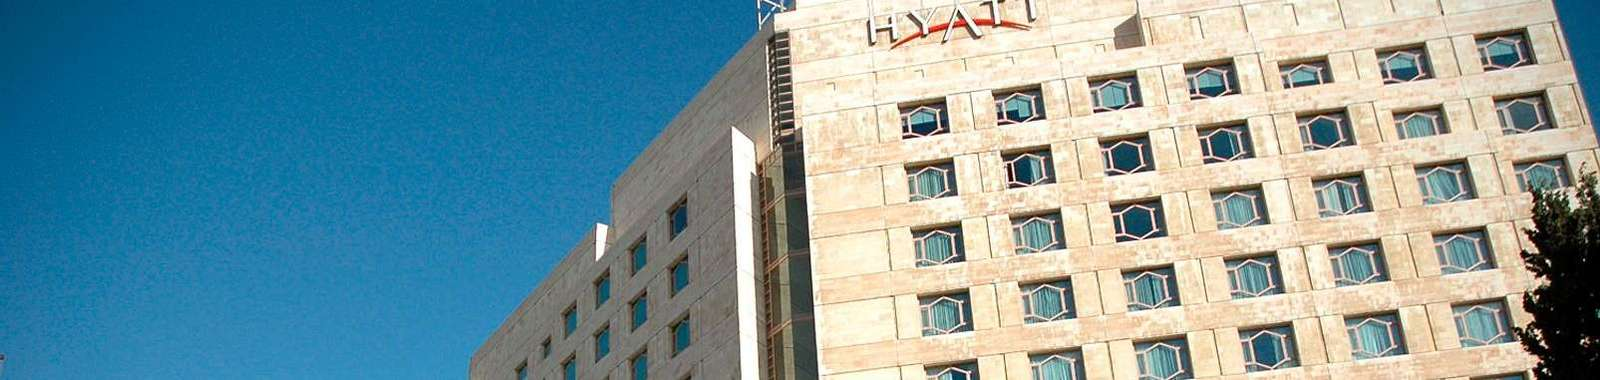 Grand Hyatt Hotel In Amman Jordan Corinthian Travel